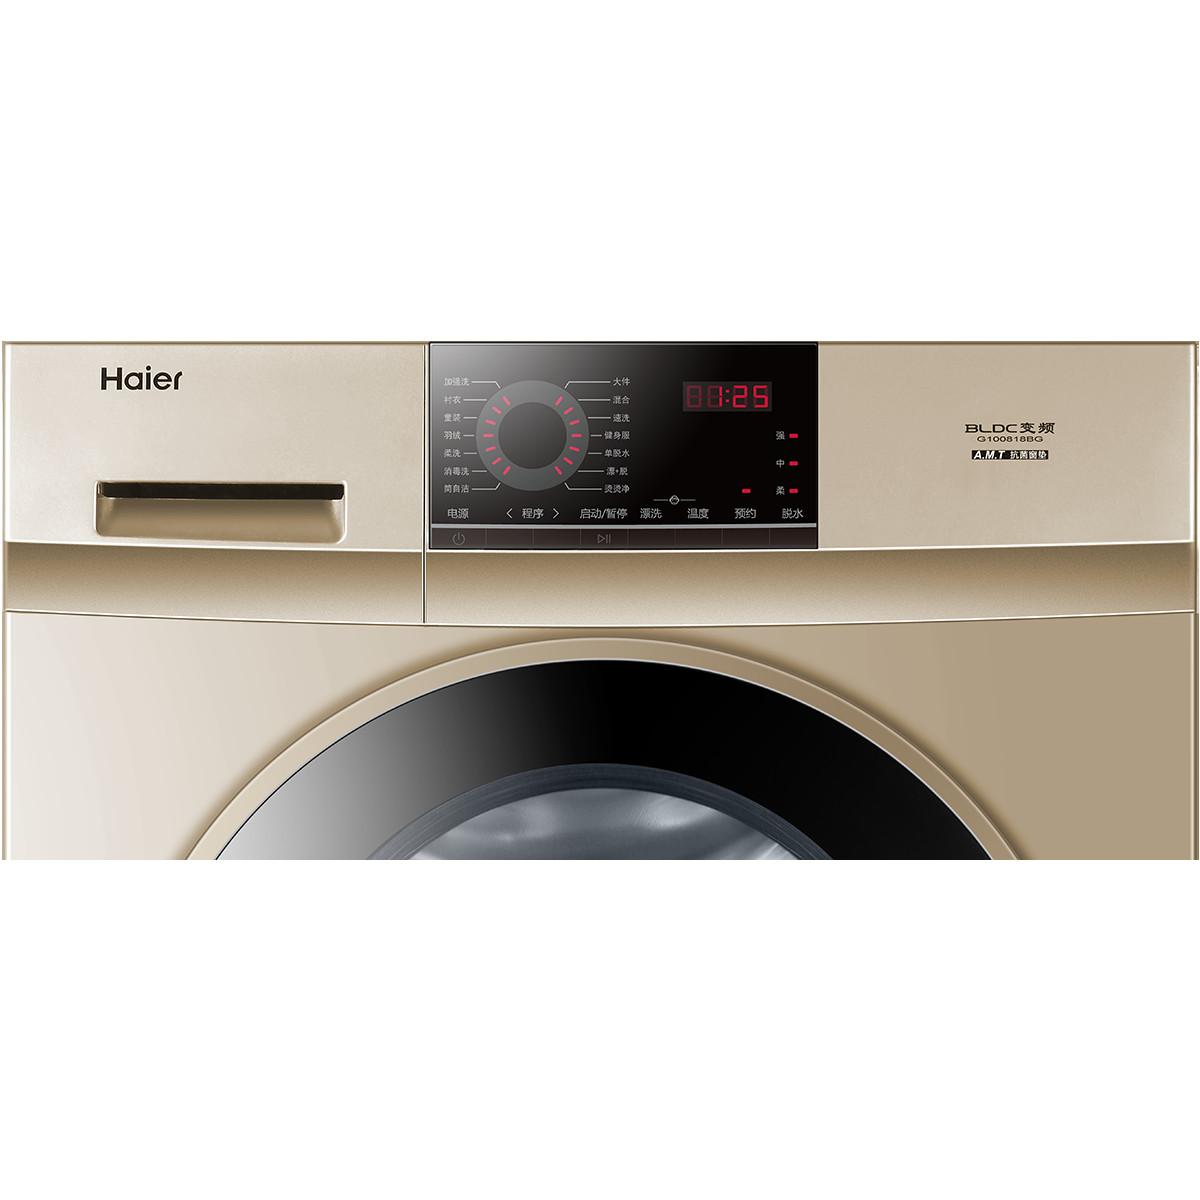 Haier/海尔                         滚筒洗衣机                         G100818BG